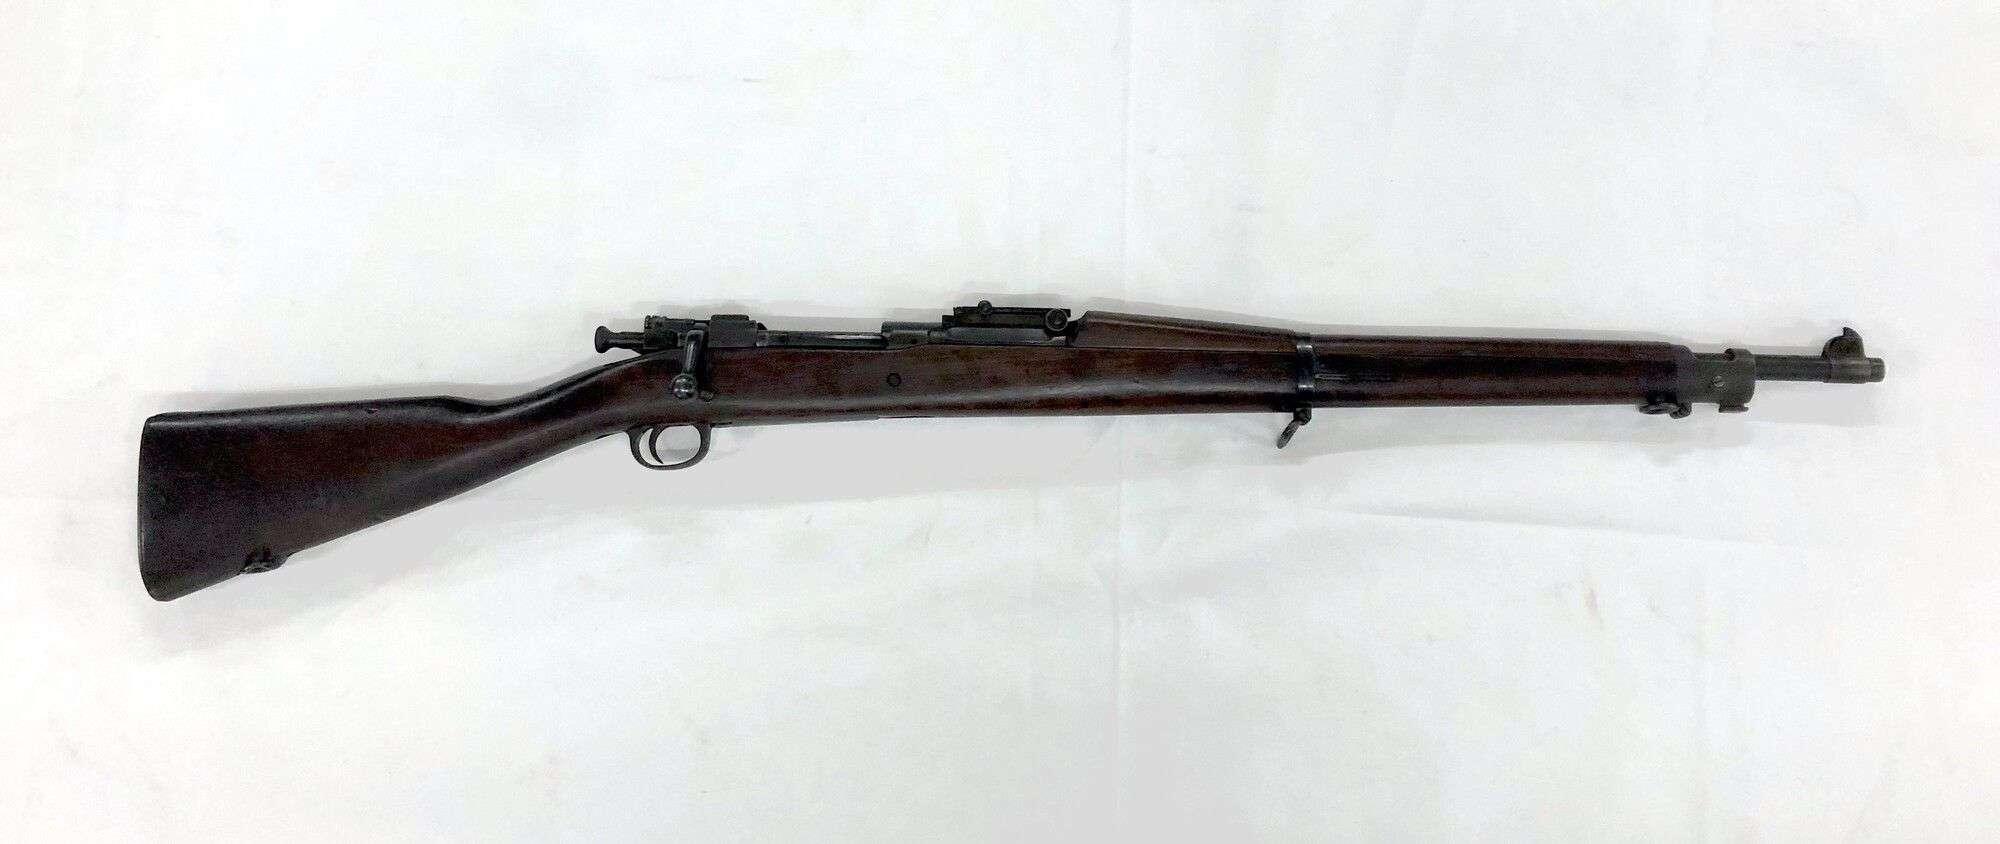 1907 Springfield Model 1903 30-06, S/N 280291 | Sunshine Coast Gun ...